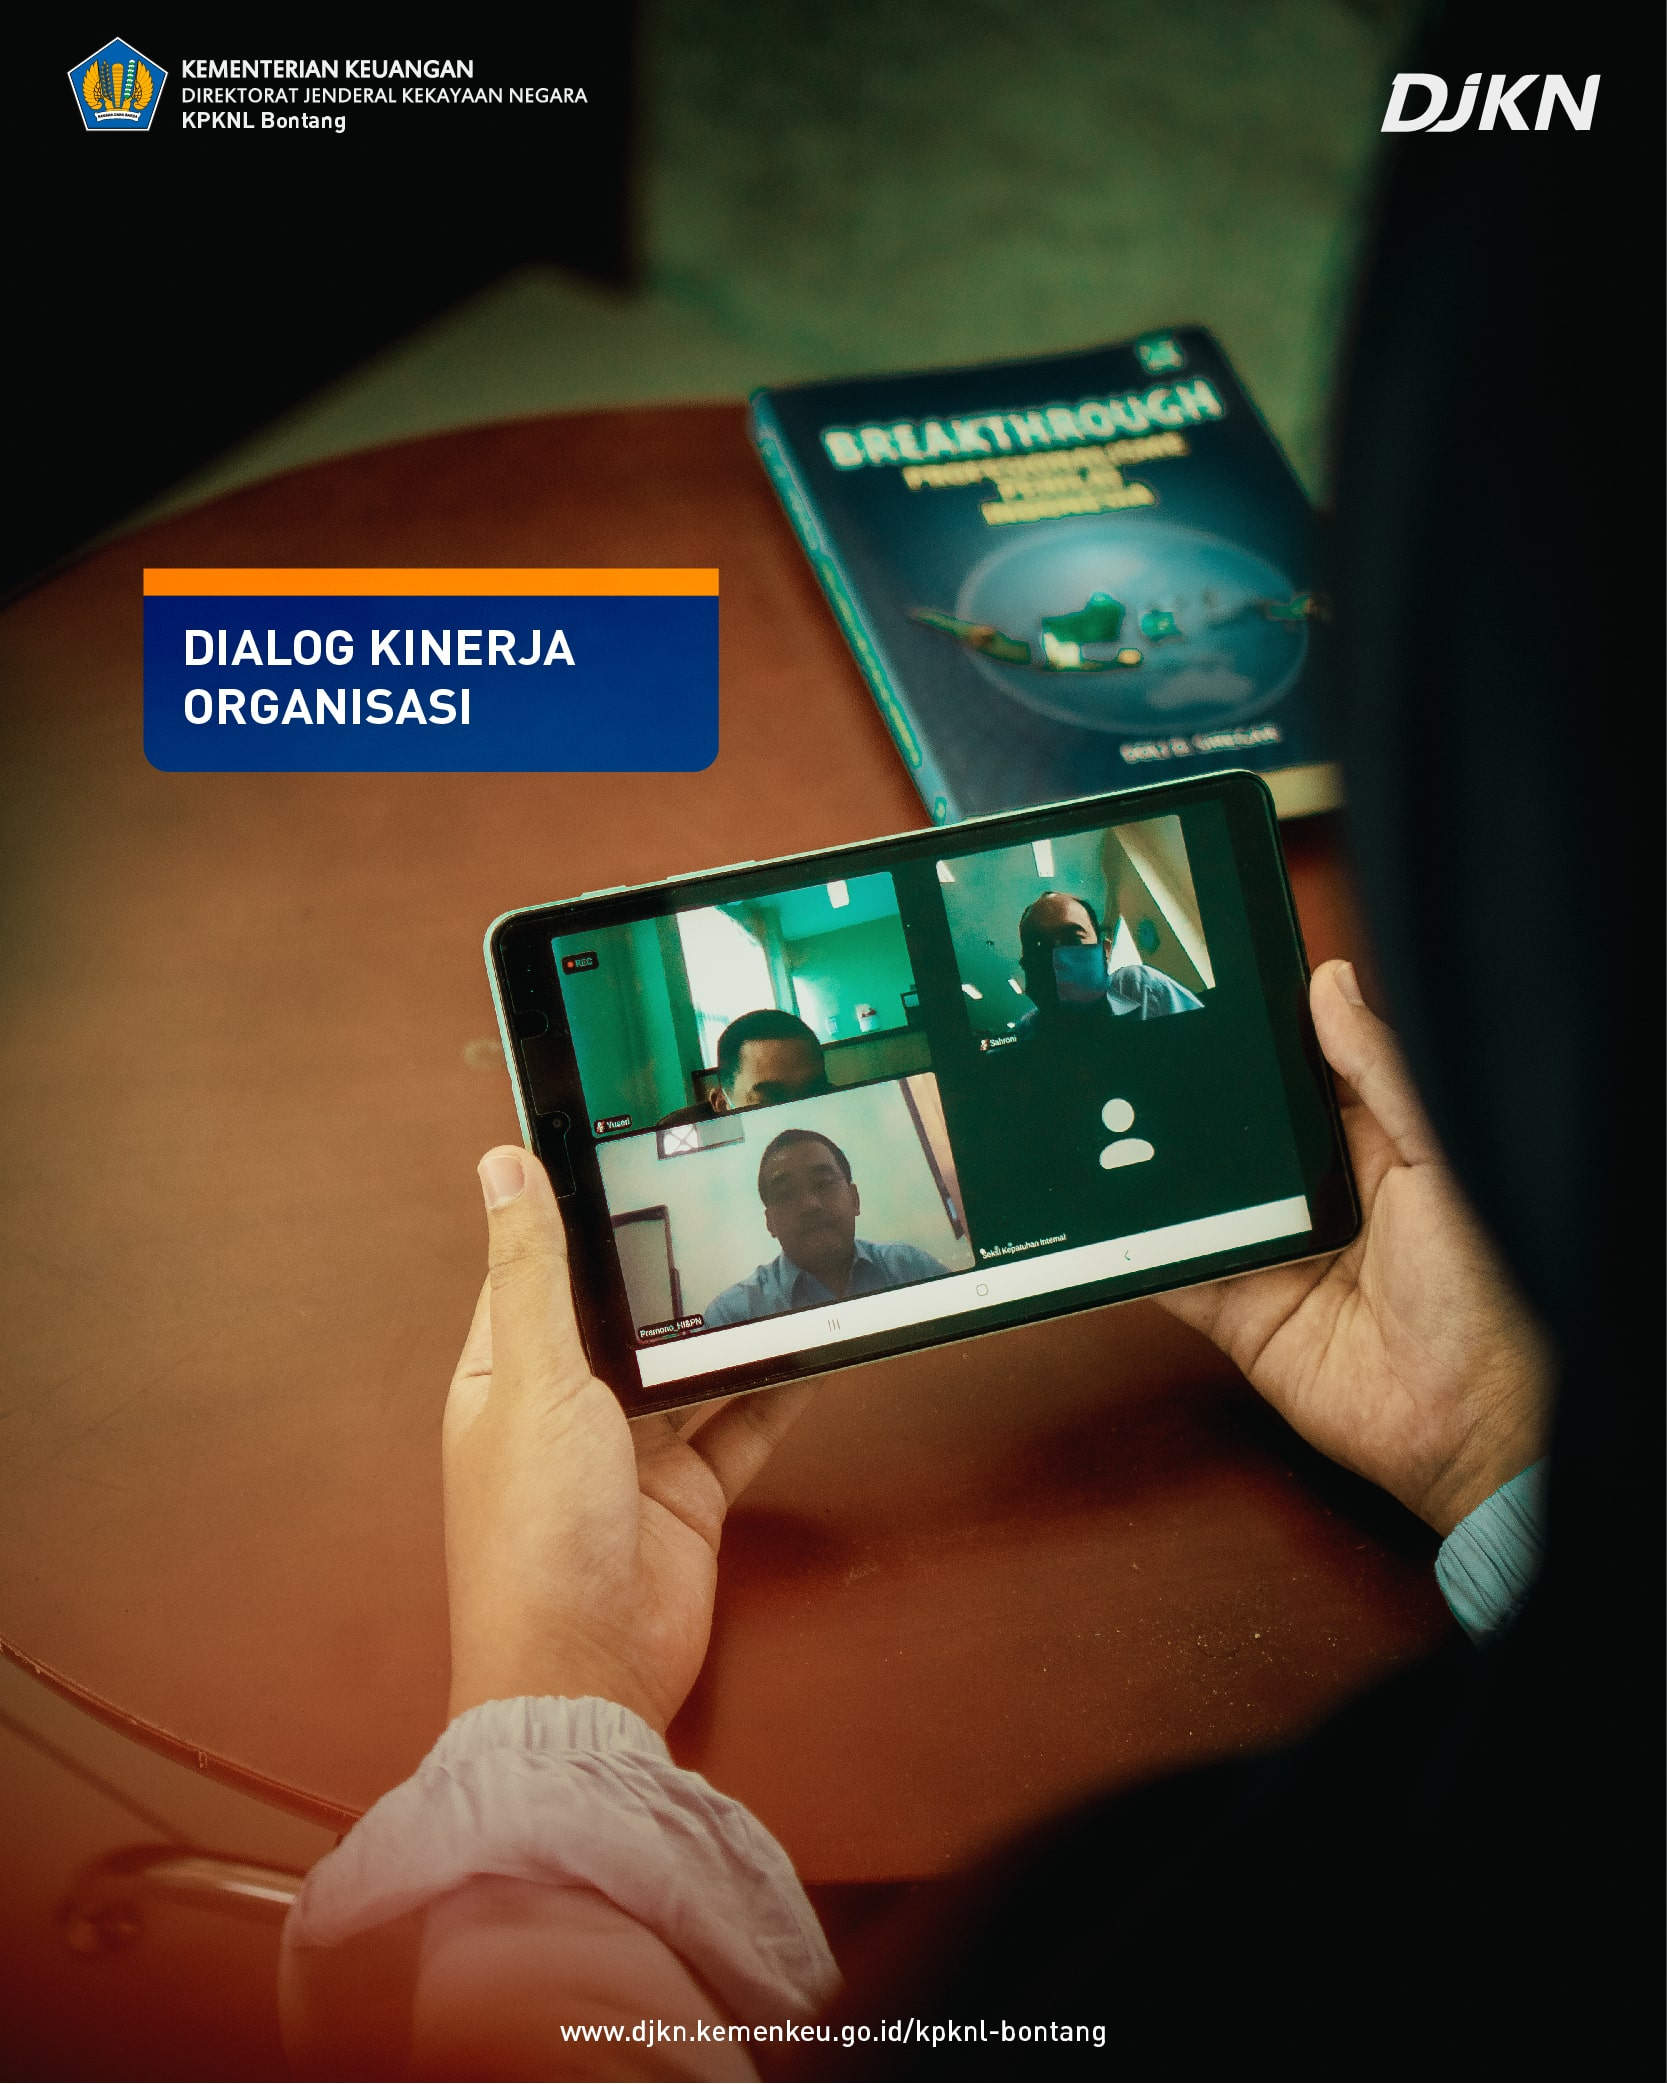 Dialog Kinerja Organisasi (DKO) Triwulan IV 2020 KPKNL Bontang: Terima Kasih 2020, Selamat Datang 2021